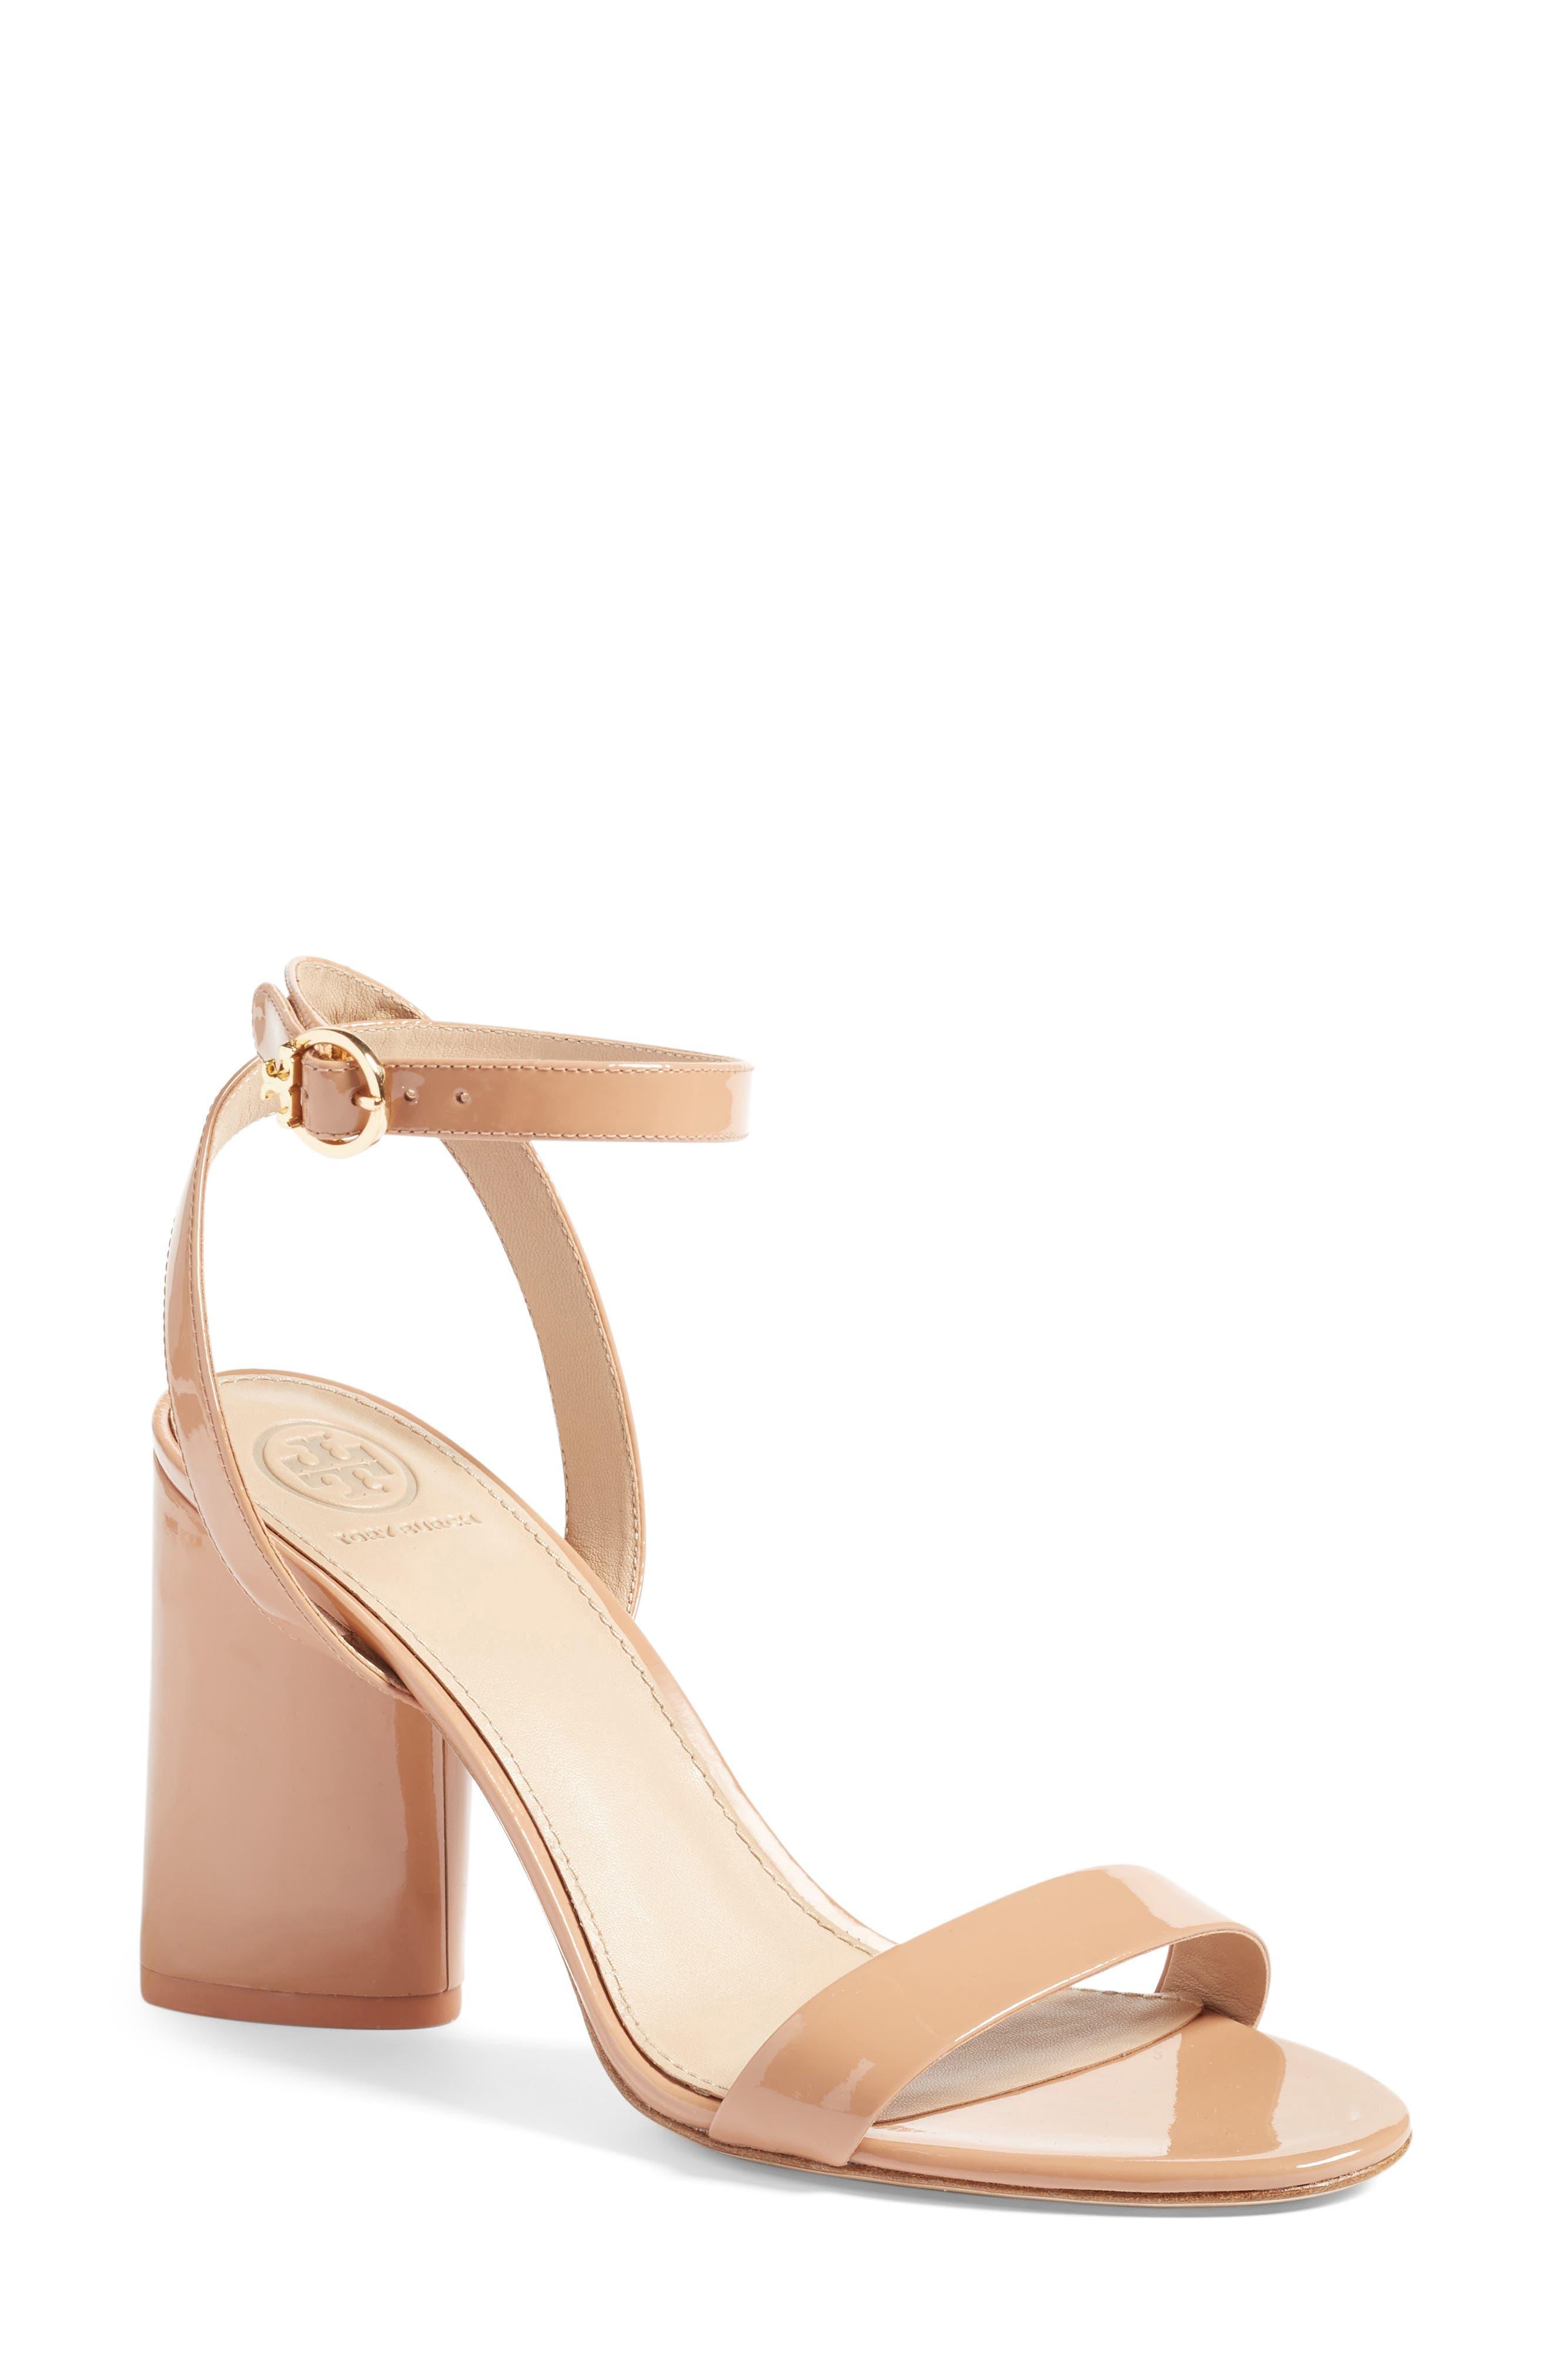 Main Image - Tory Burch Elizabeth Block Heel Sandal (Women)